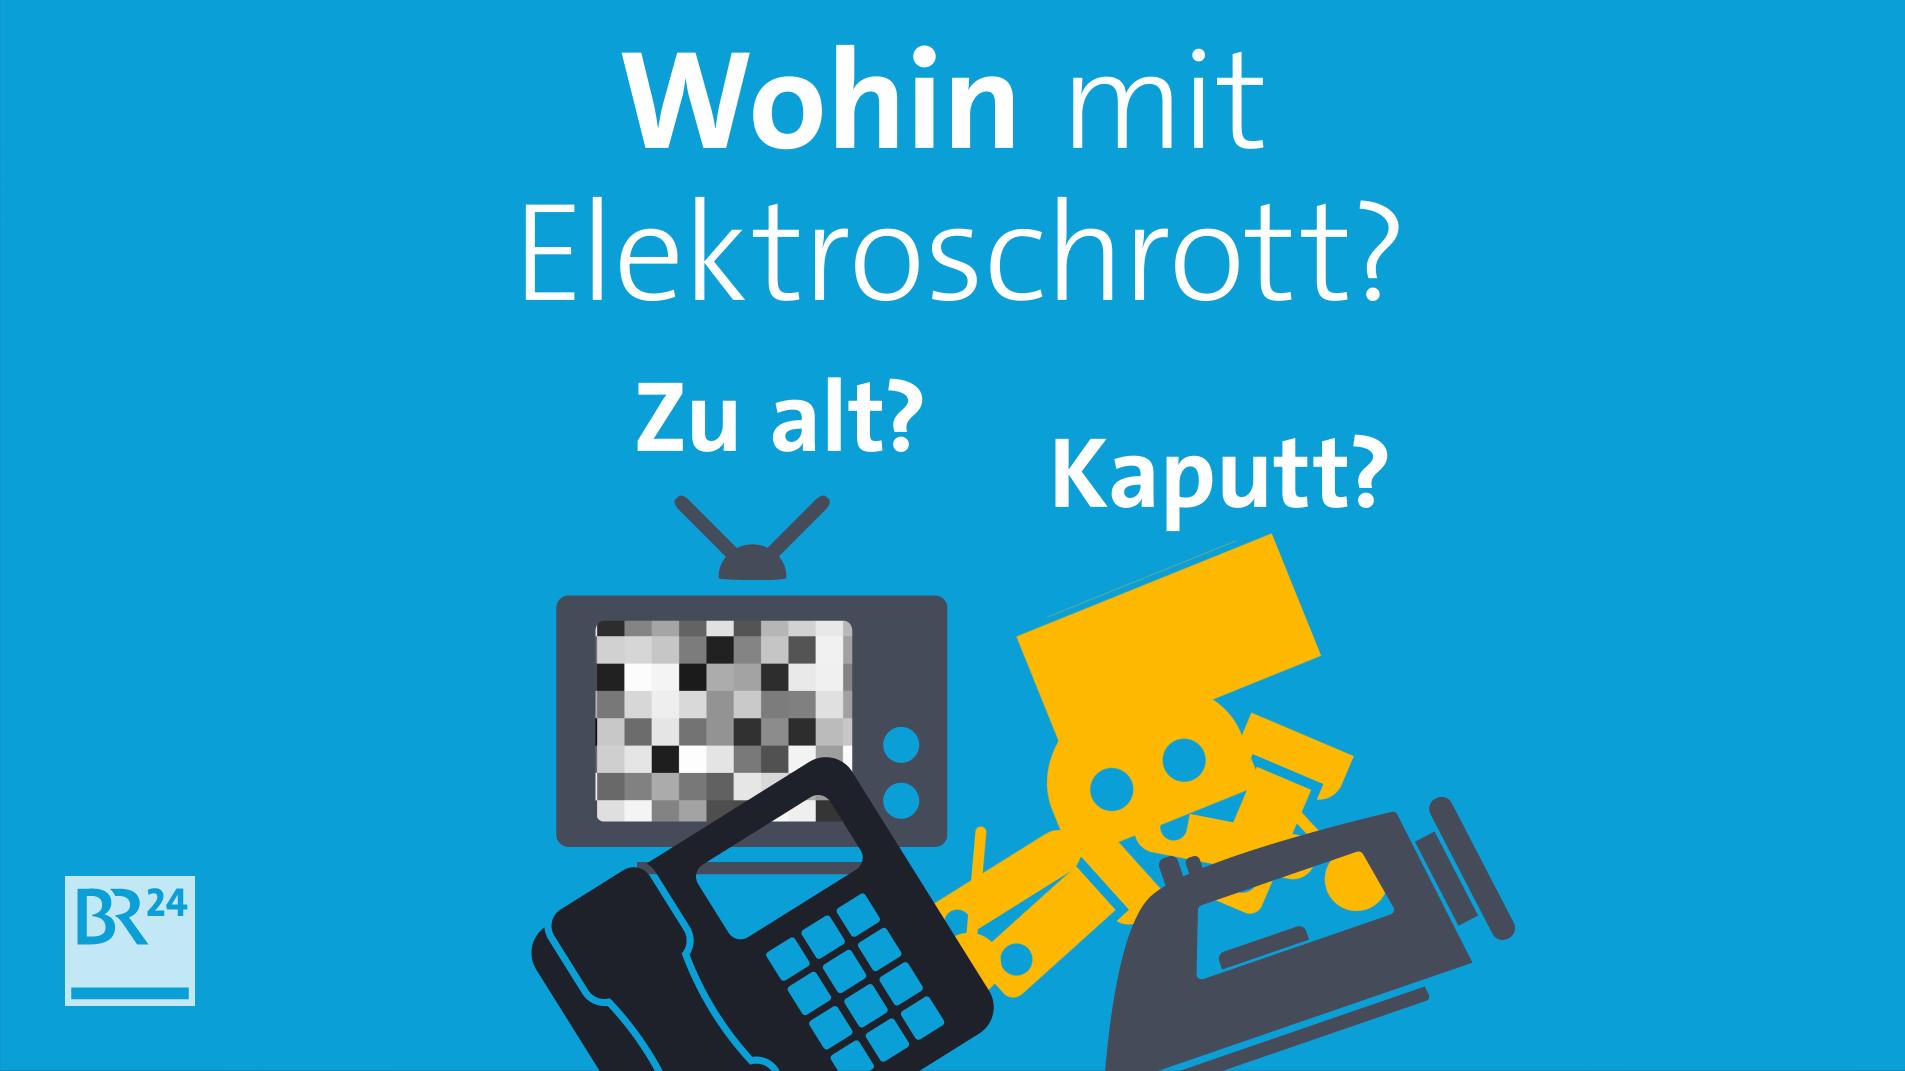 #fragBR24💡 Wohin mit dem Elektroschrott?